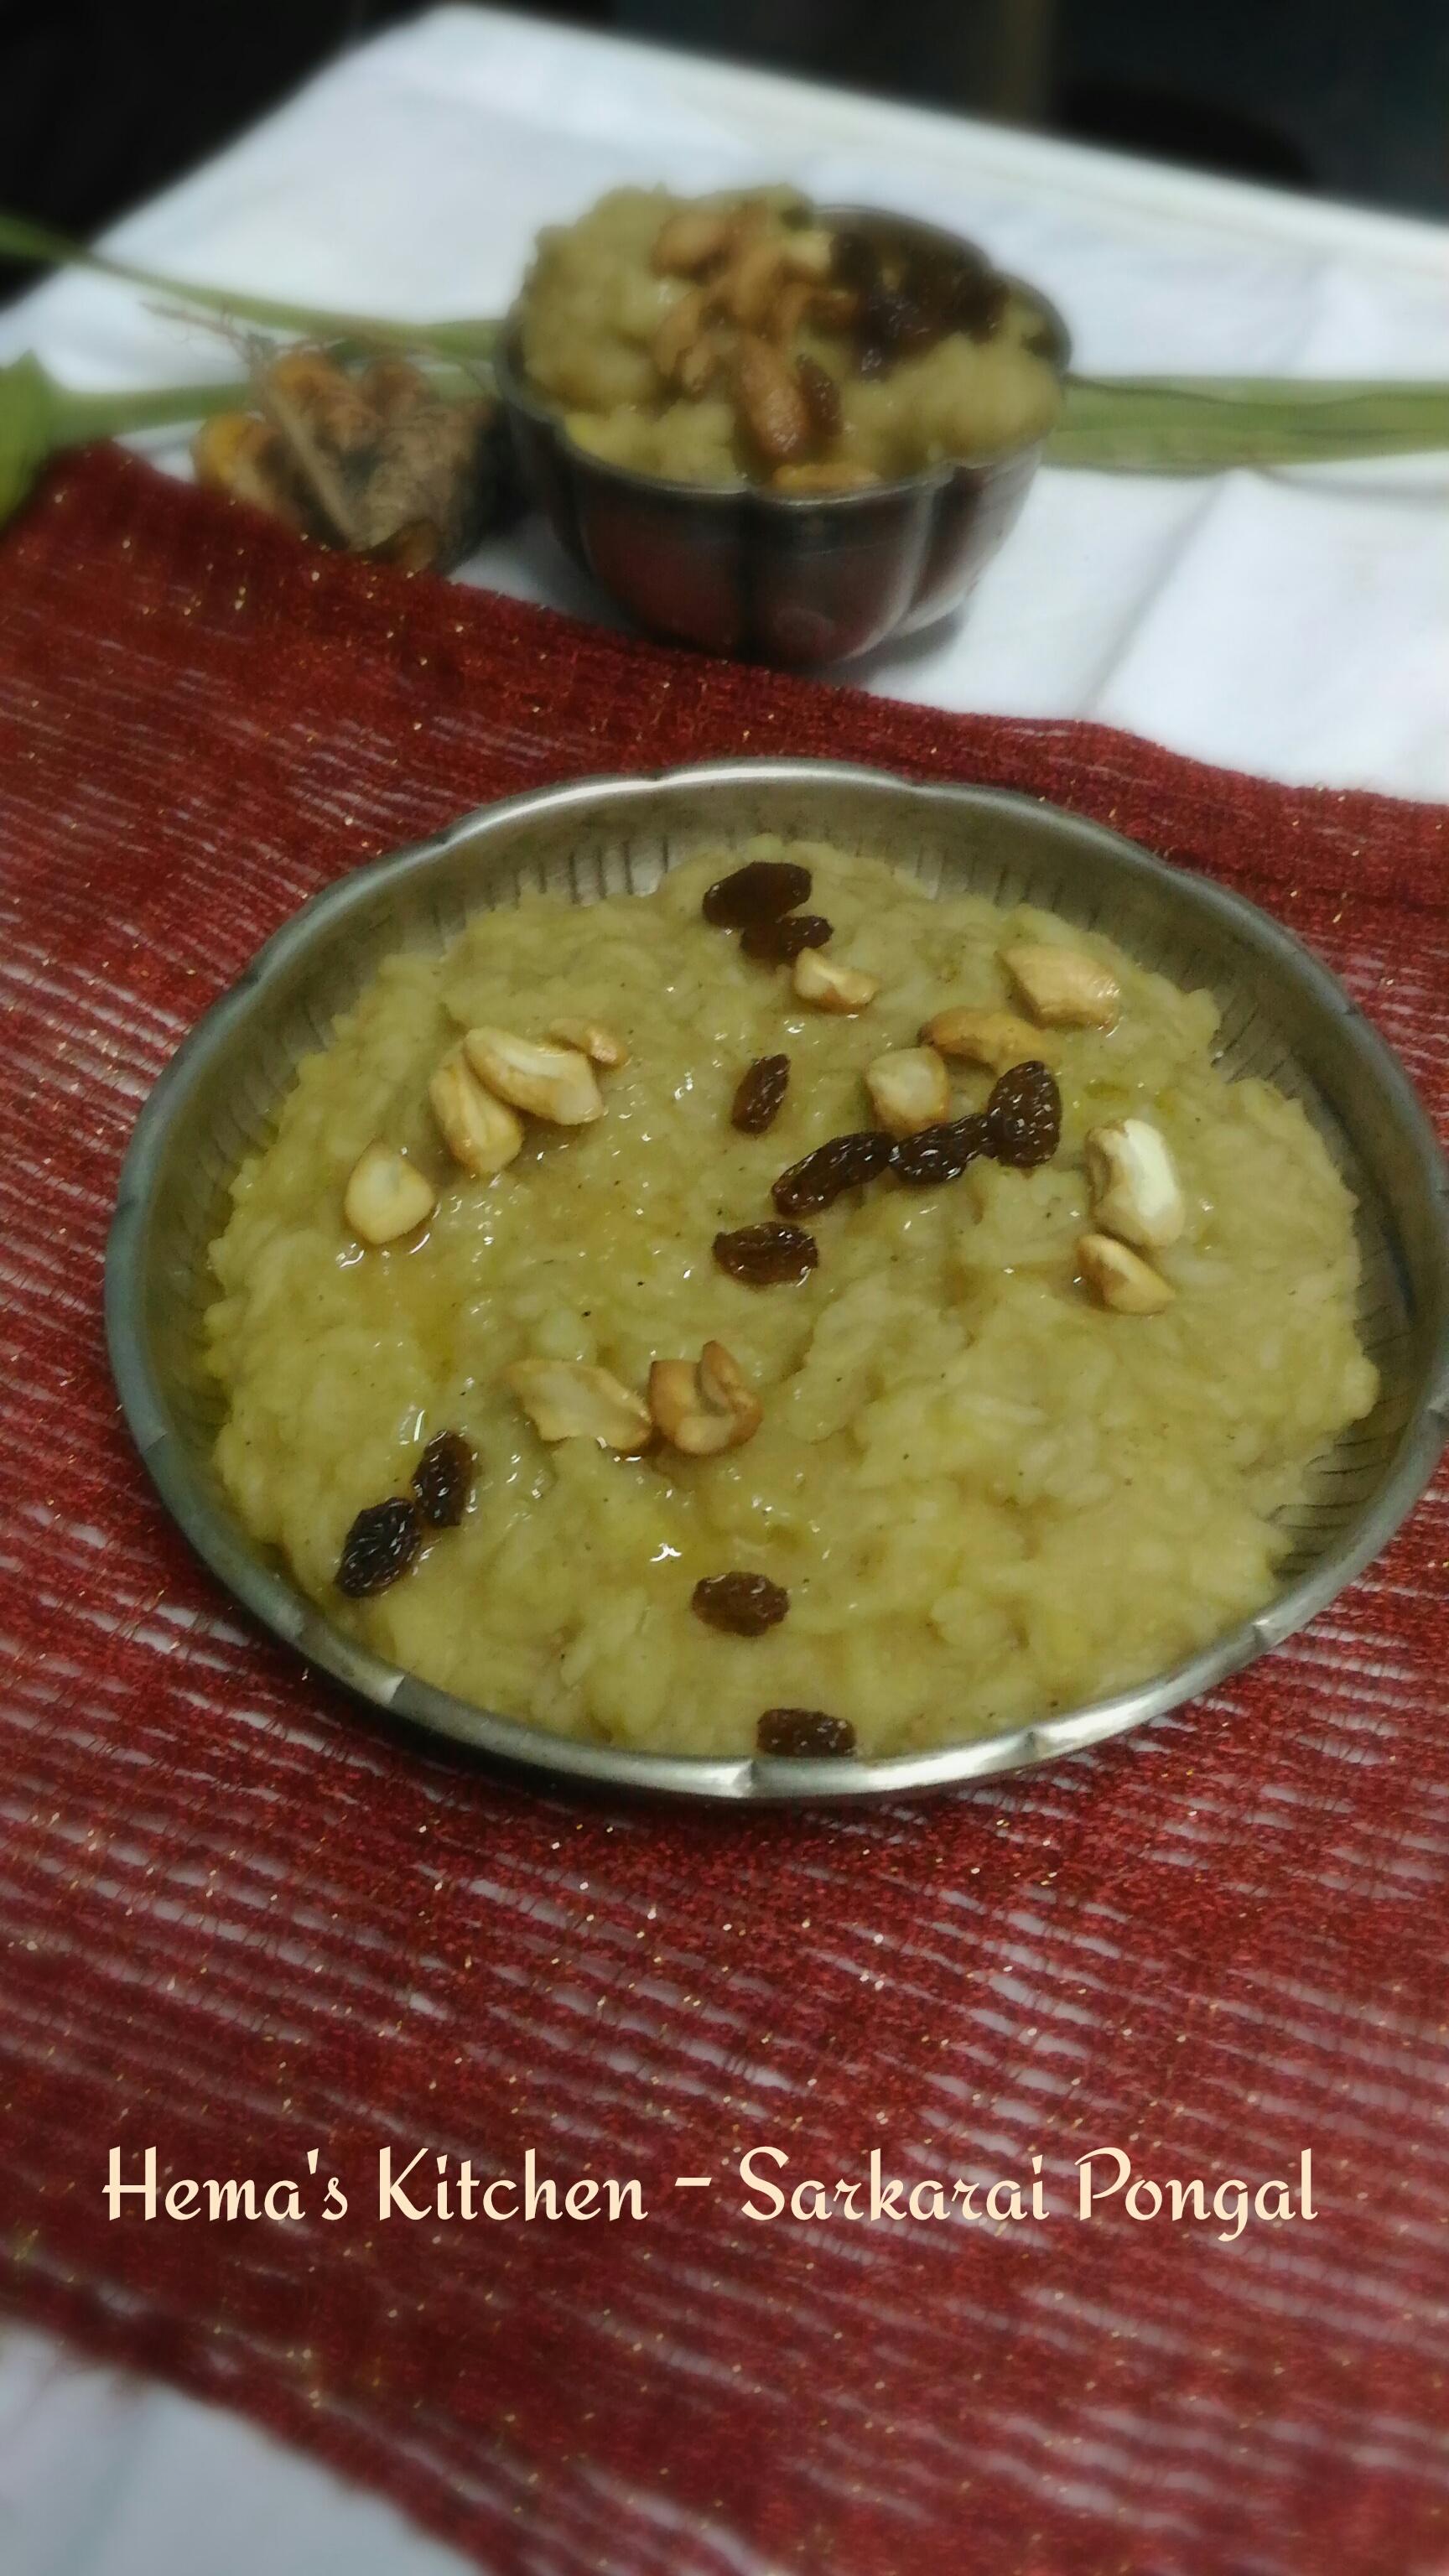 sarkkarai pongal or sweet pongal with milk hema s kitchen